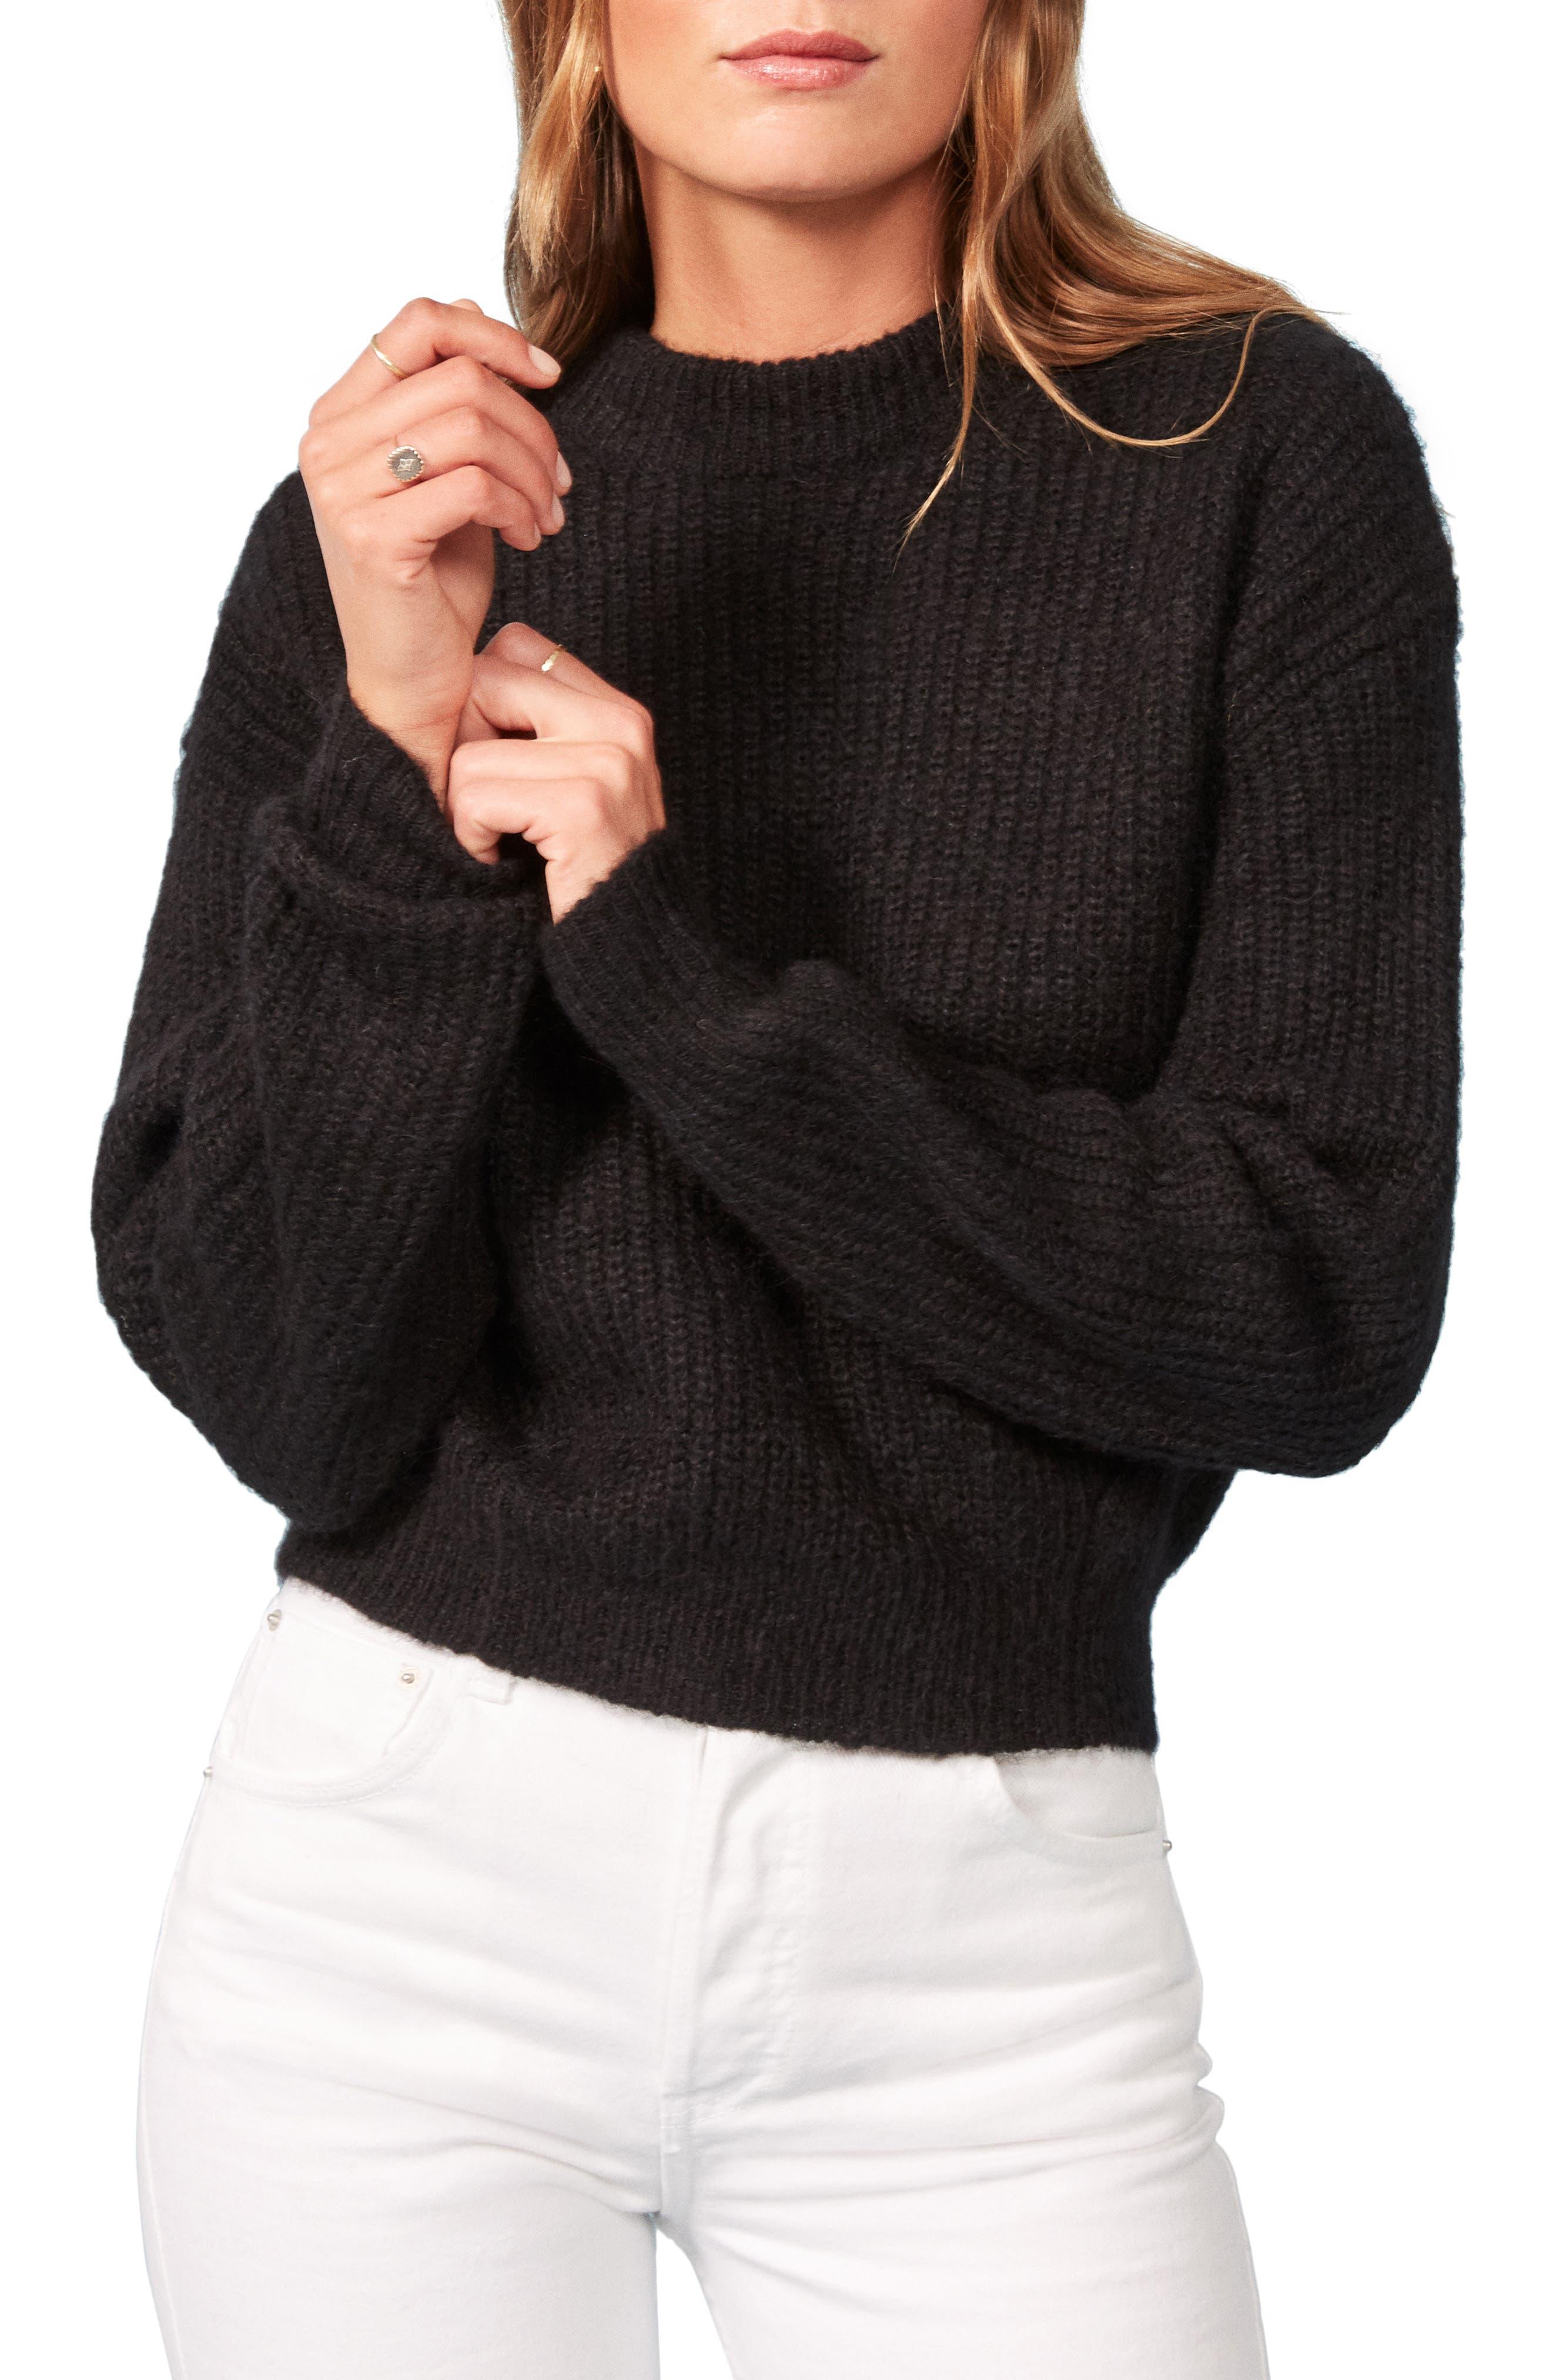 Finn Sweater,                         Main,                         color, BLACK